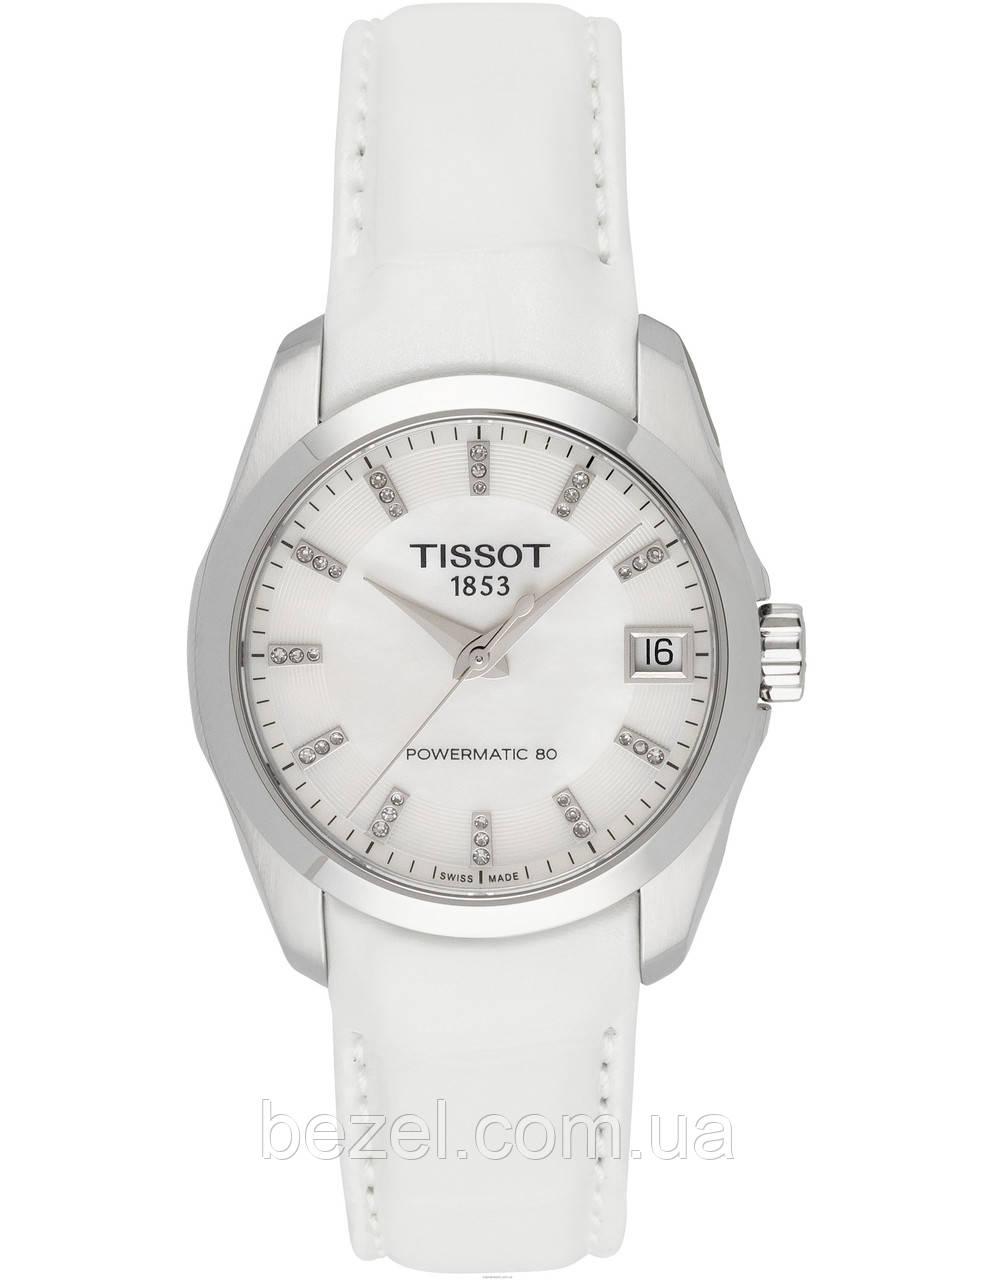 Женские часы Tissot T035.207.16.116.00